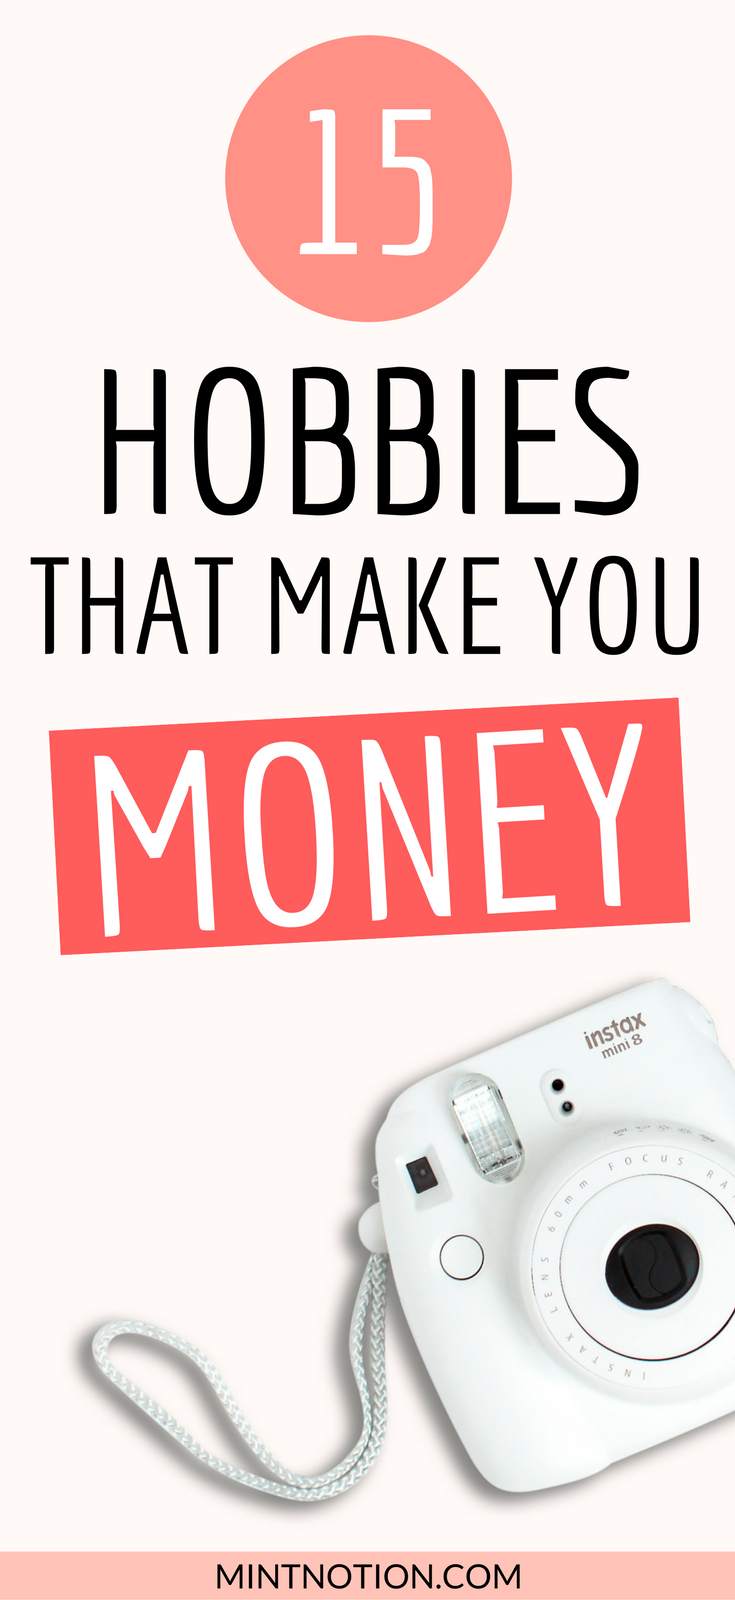 15 Fun Hobbies That Can Make You Money - Mint Notion